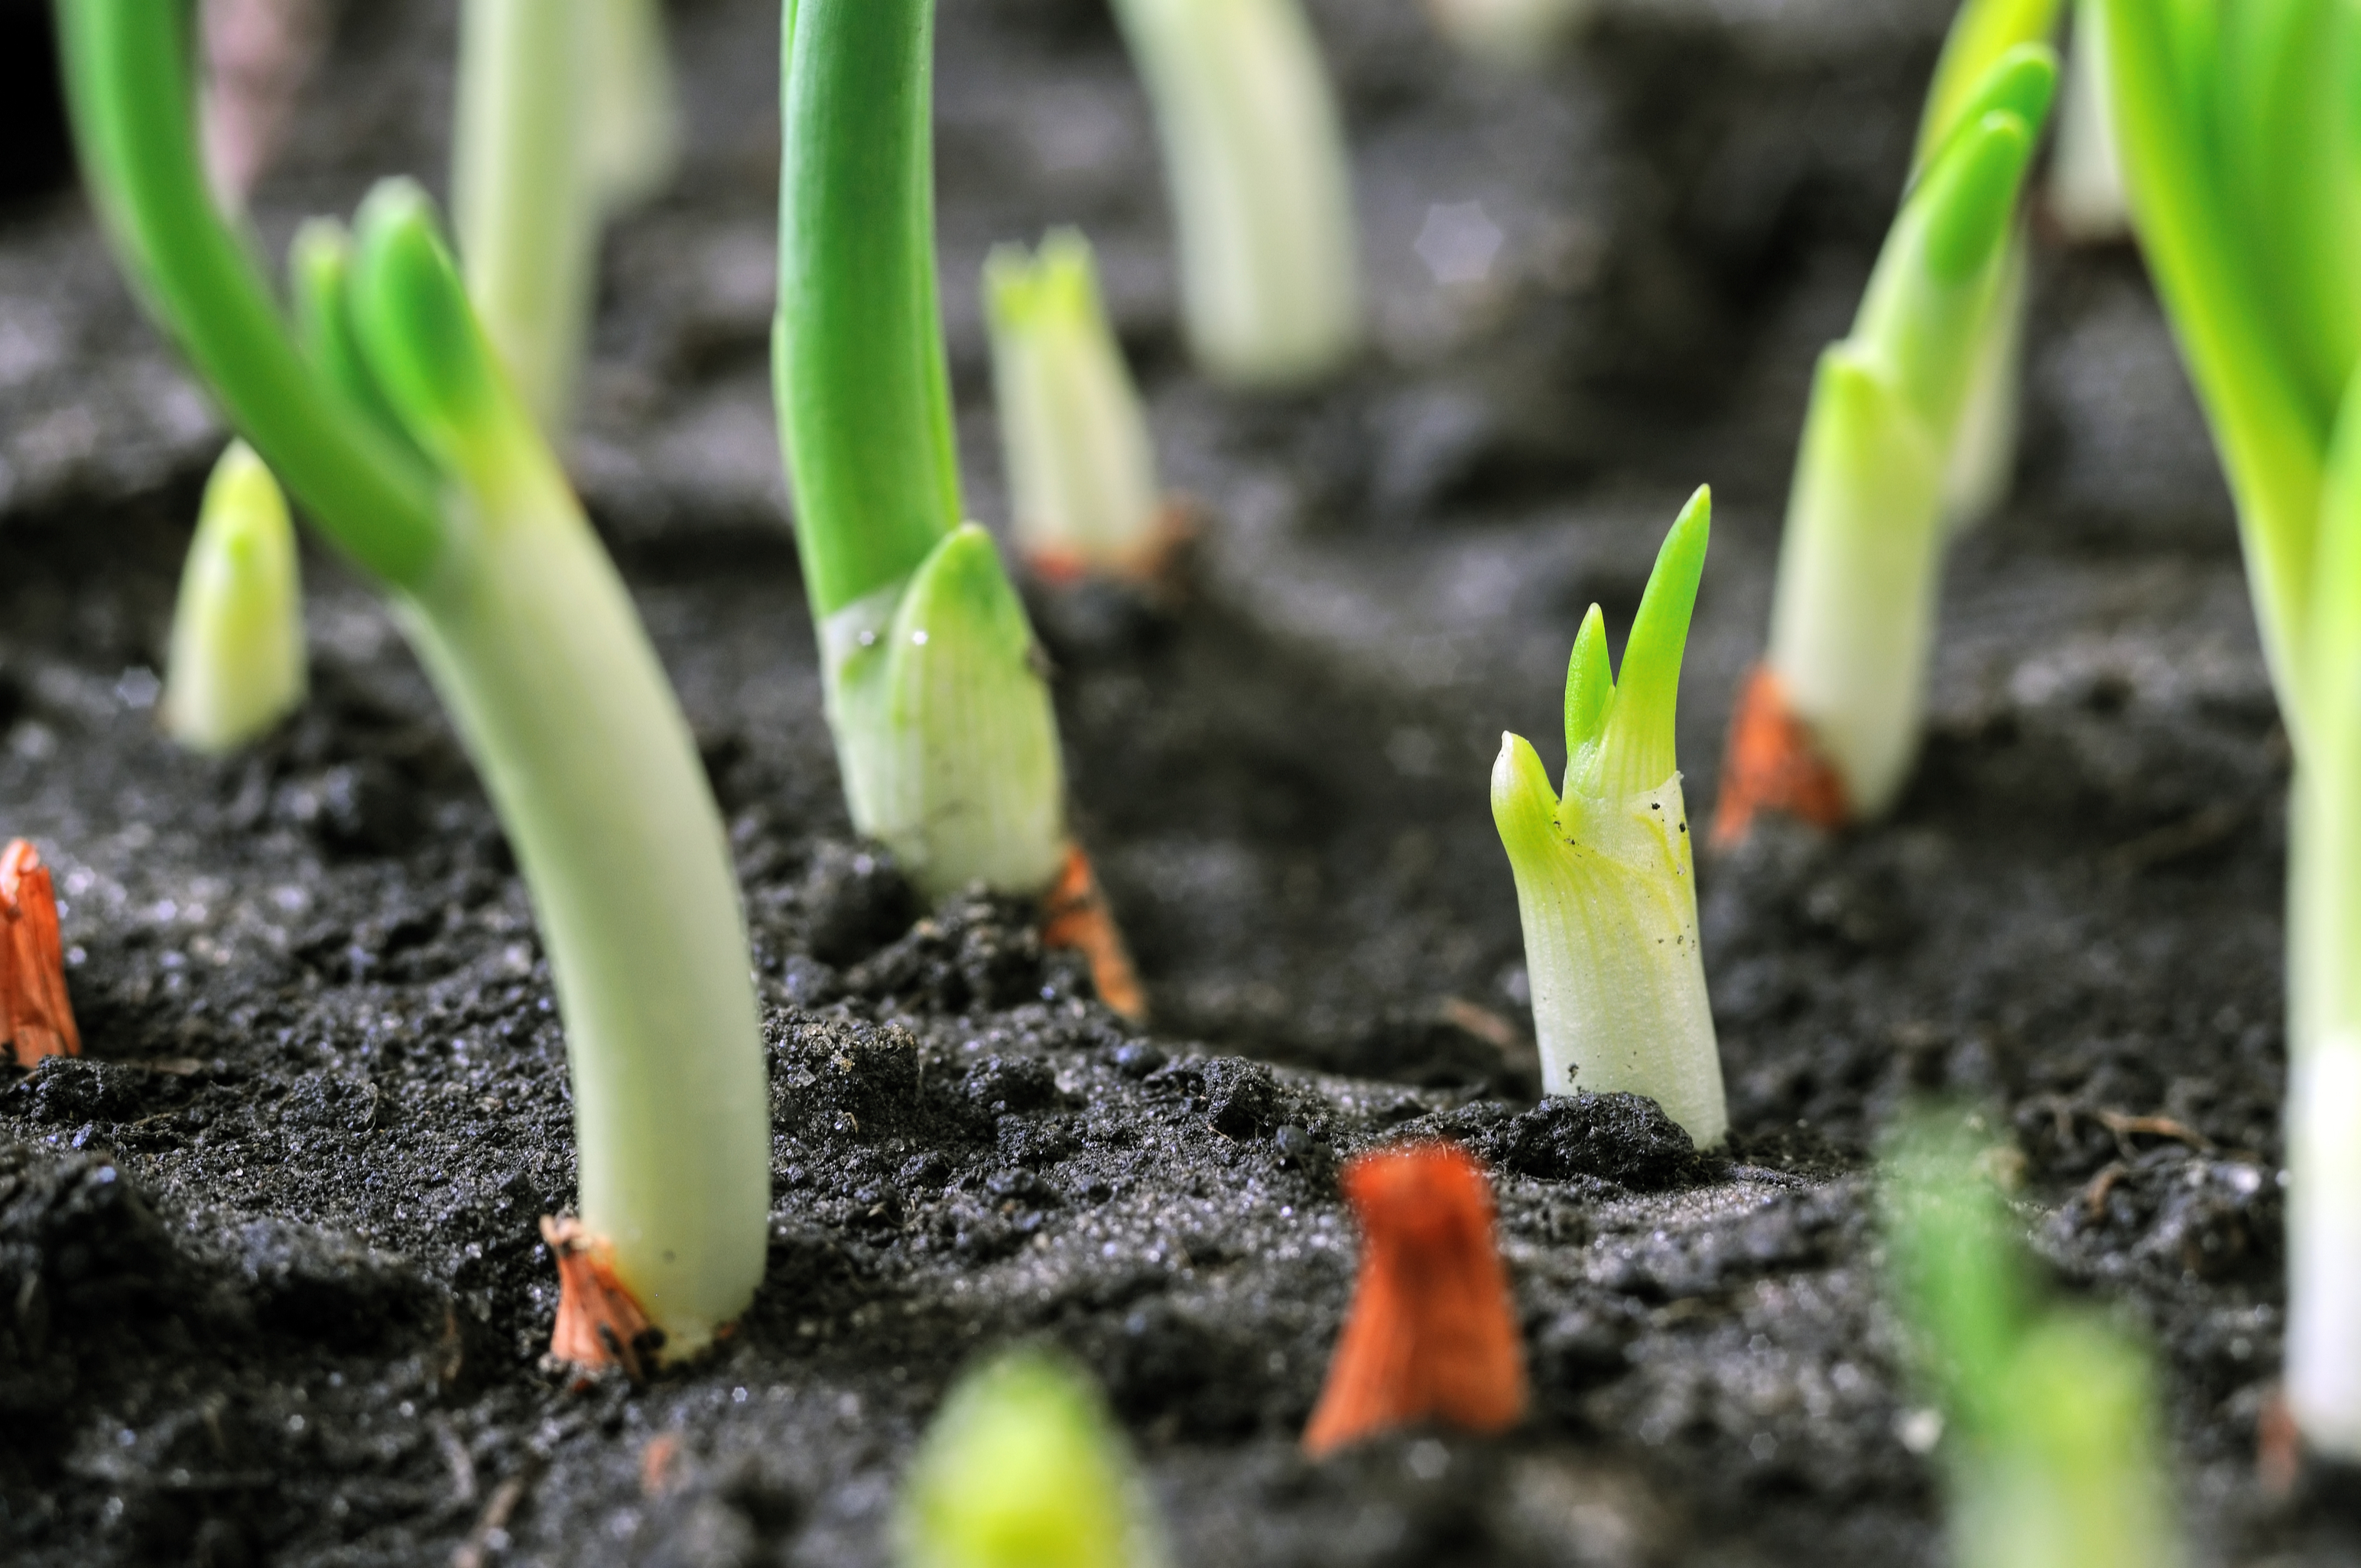 april   april gardening tips   garden   gardening tips   spring   gardener's almanac   guide to gardening